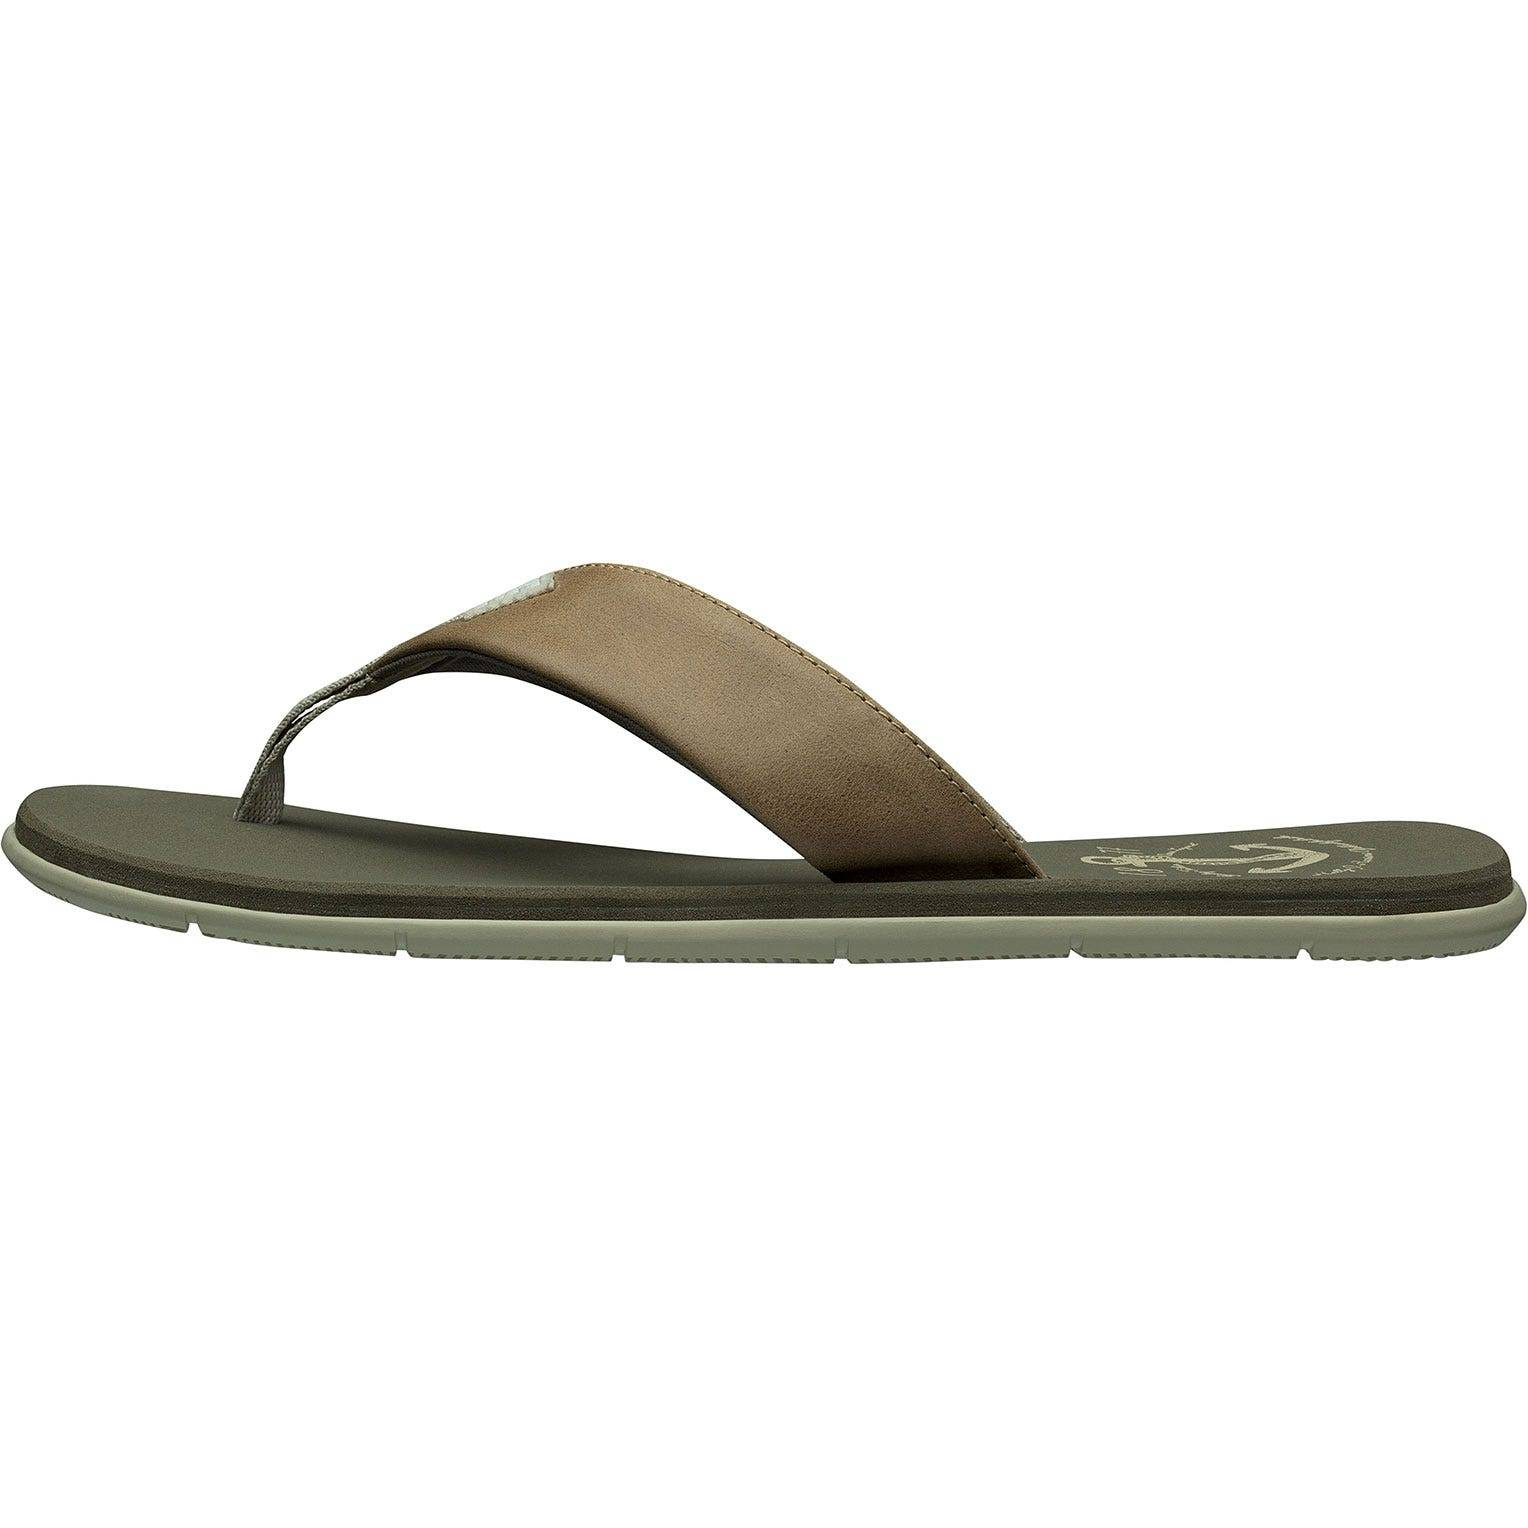 Helly Hansen Seasand Leather Sandal Mens Beige 44/10